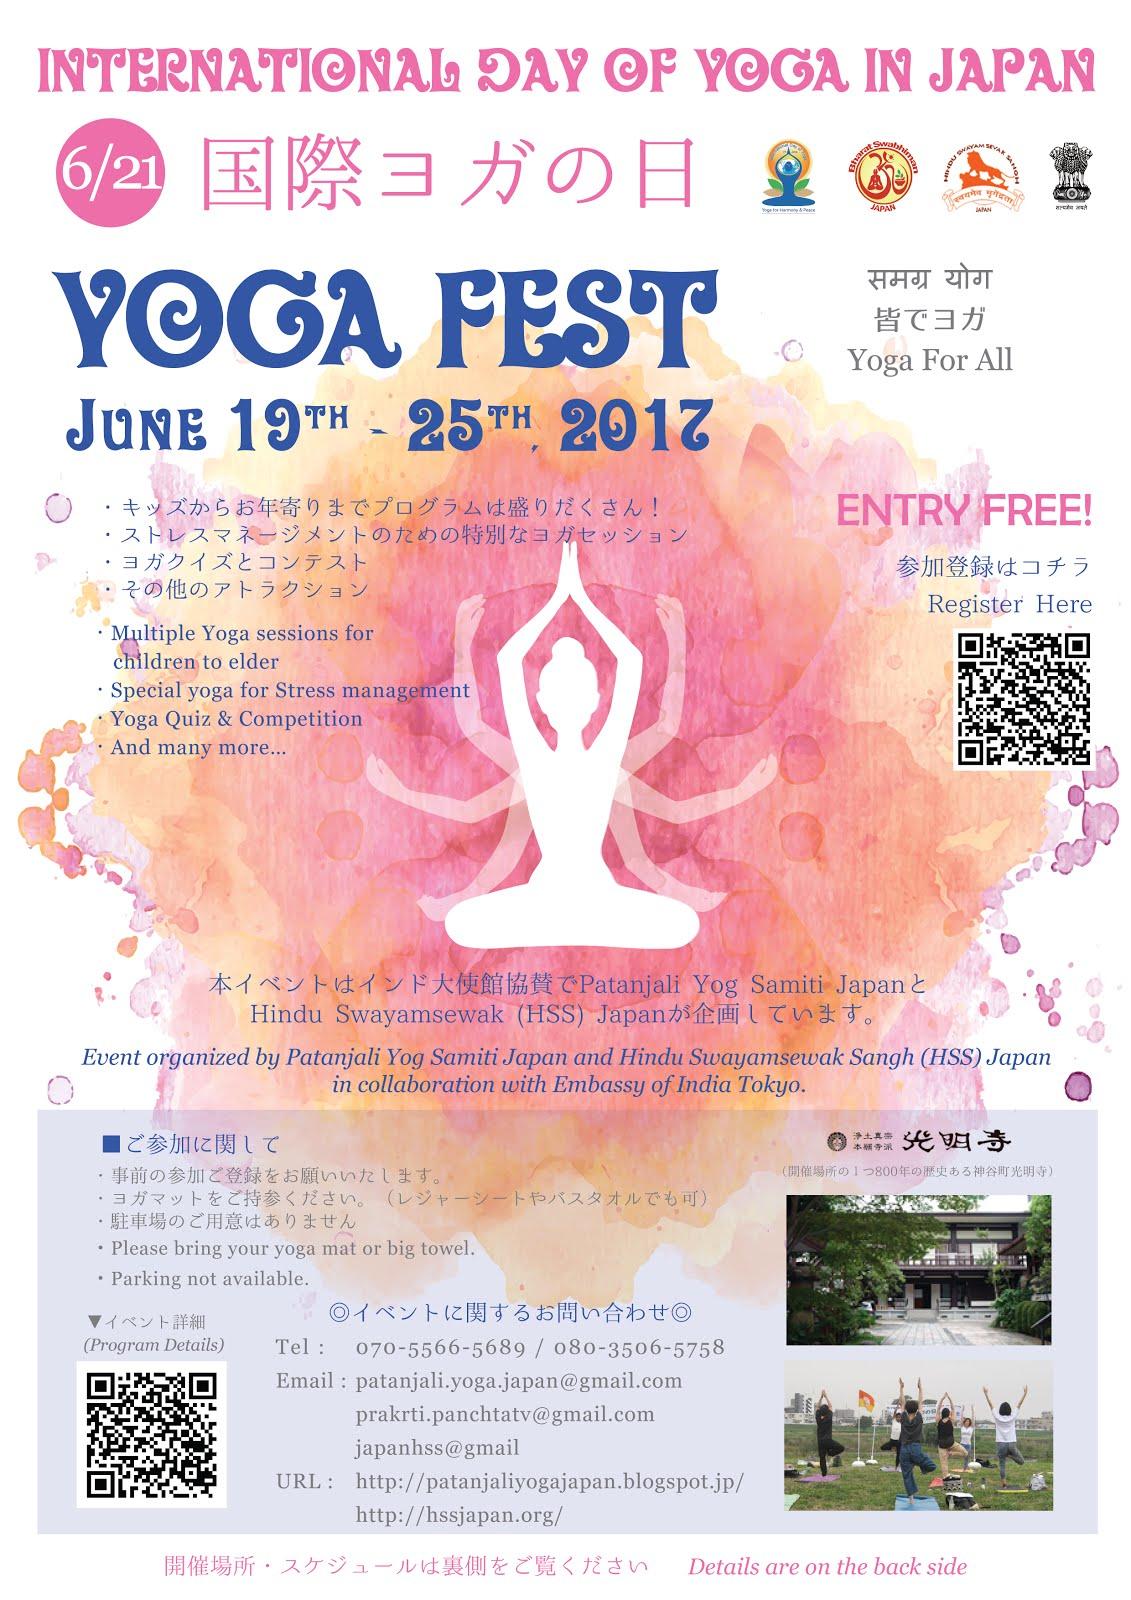 patanjali yoga samiti japan international day of yoga 2017 japan